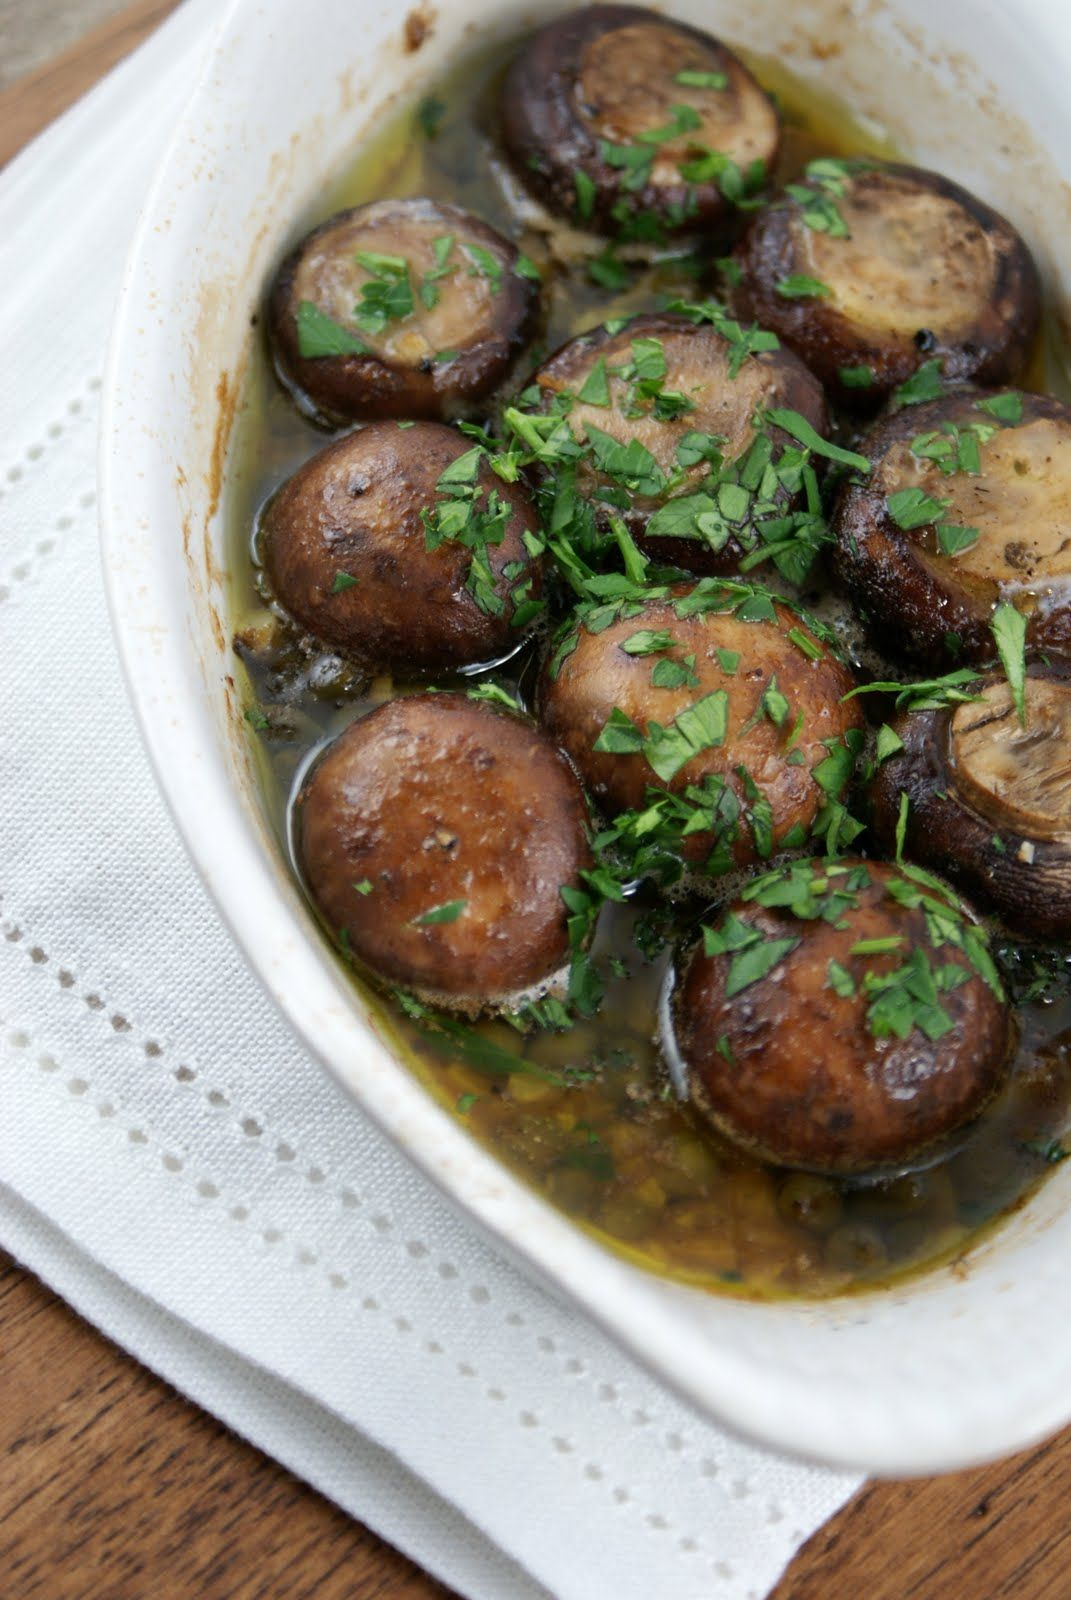 Authentic Suburban Gourmet: { Roasted Garlic Mushrooms }